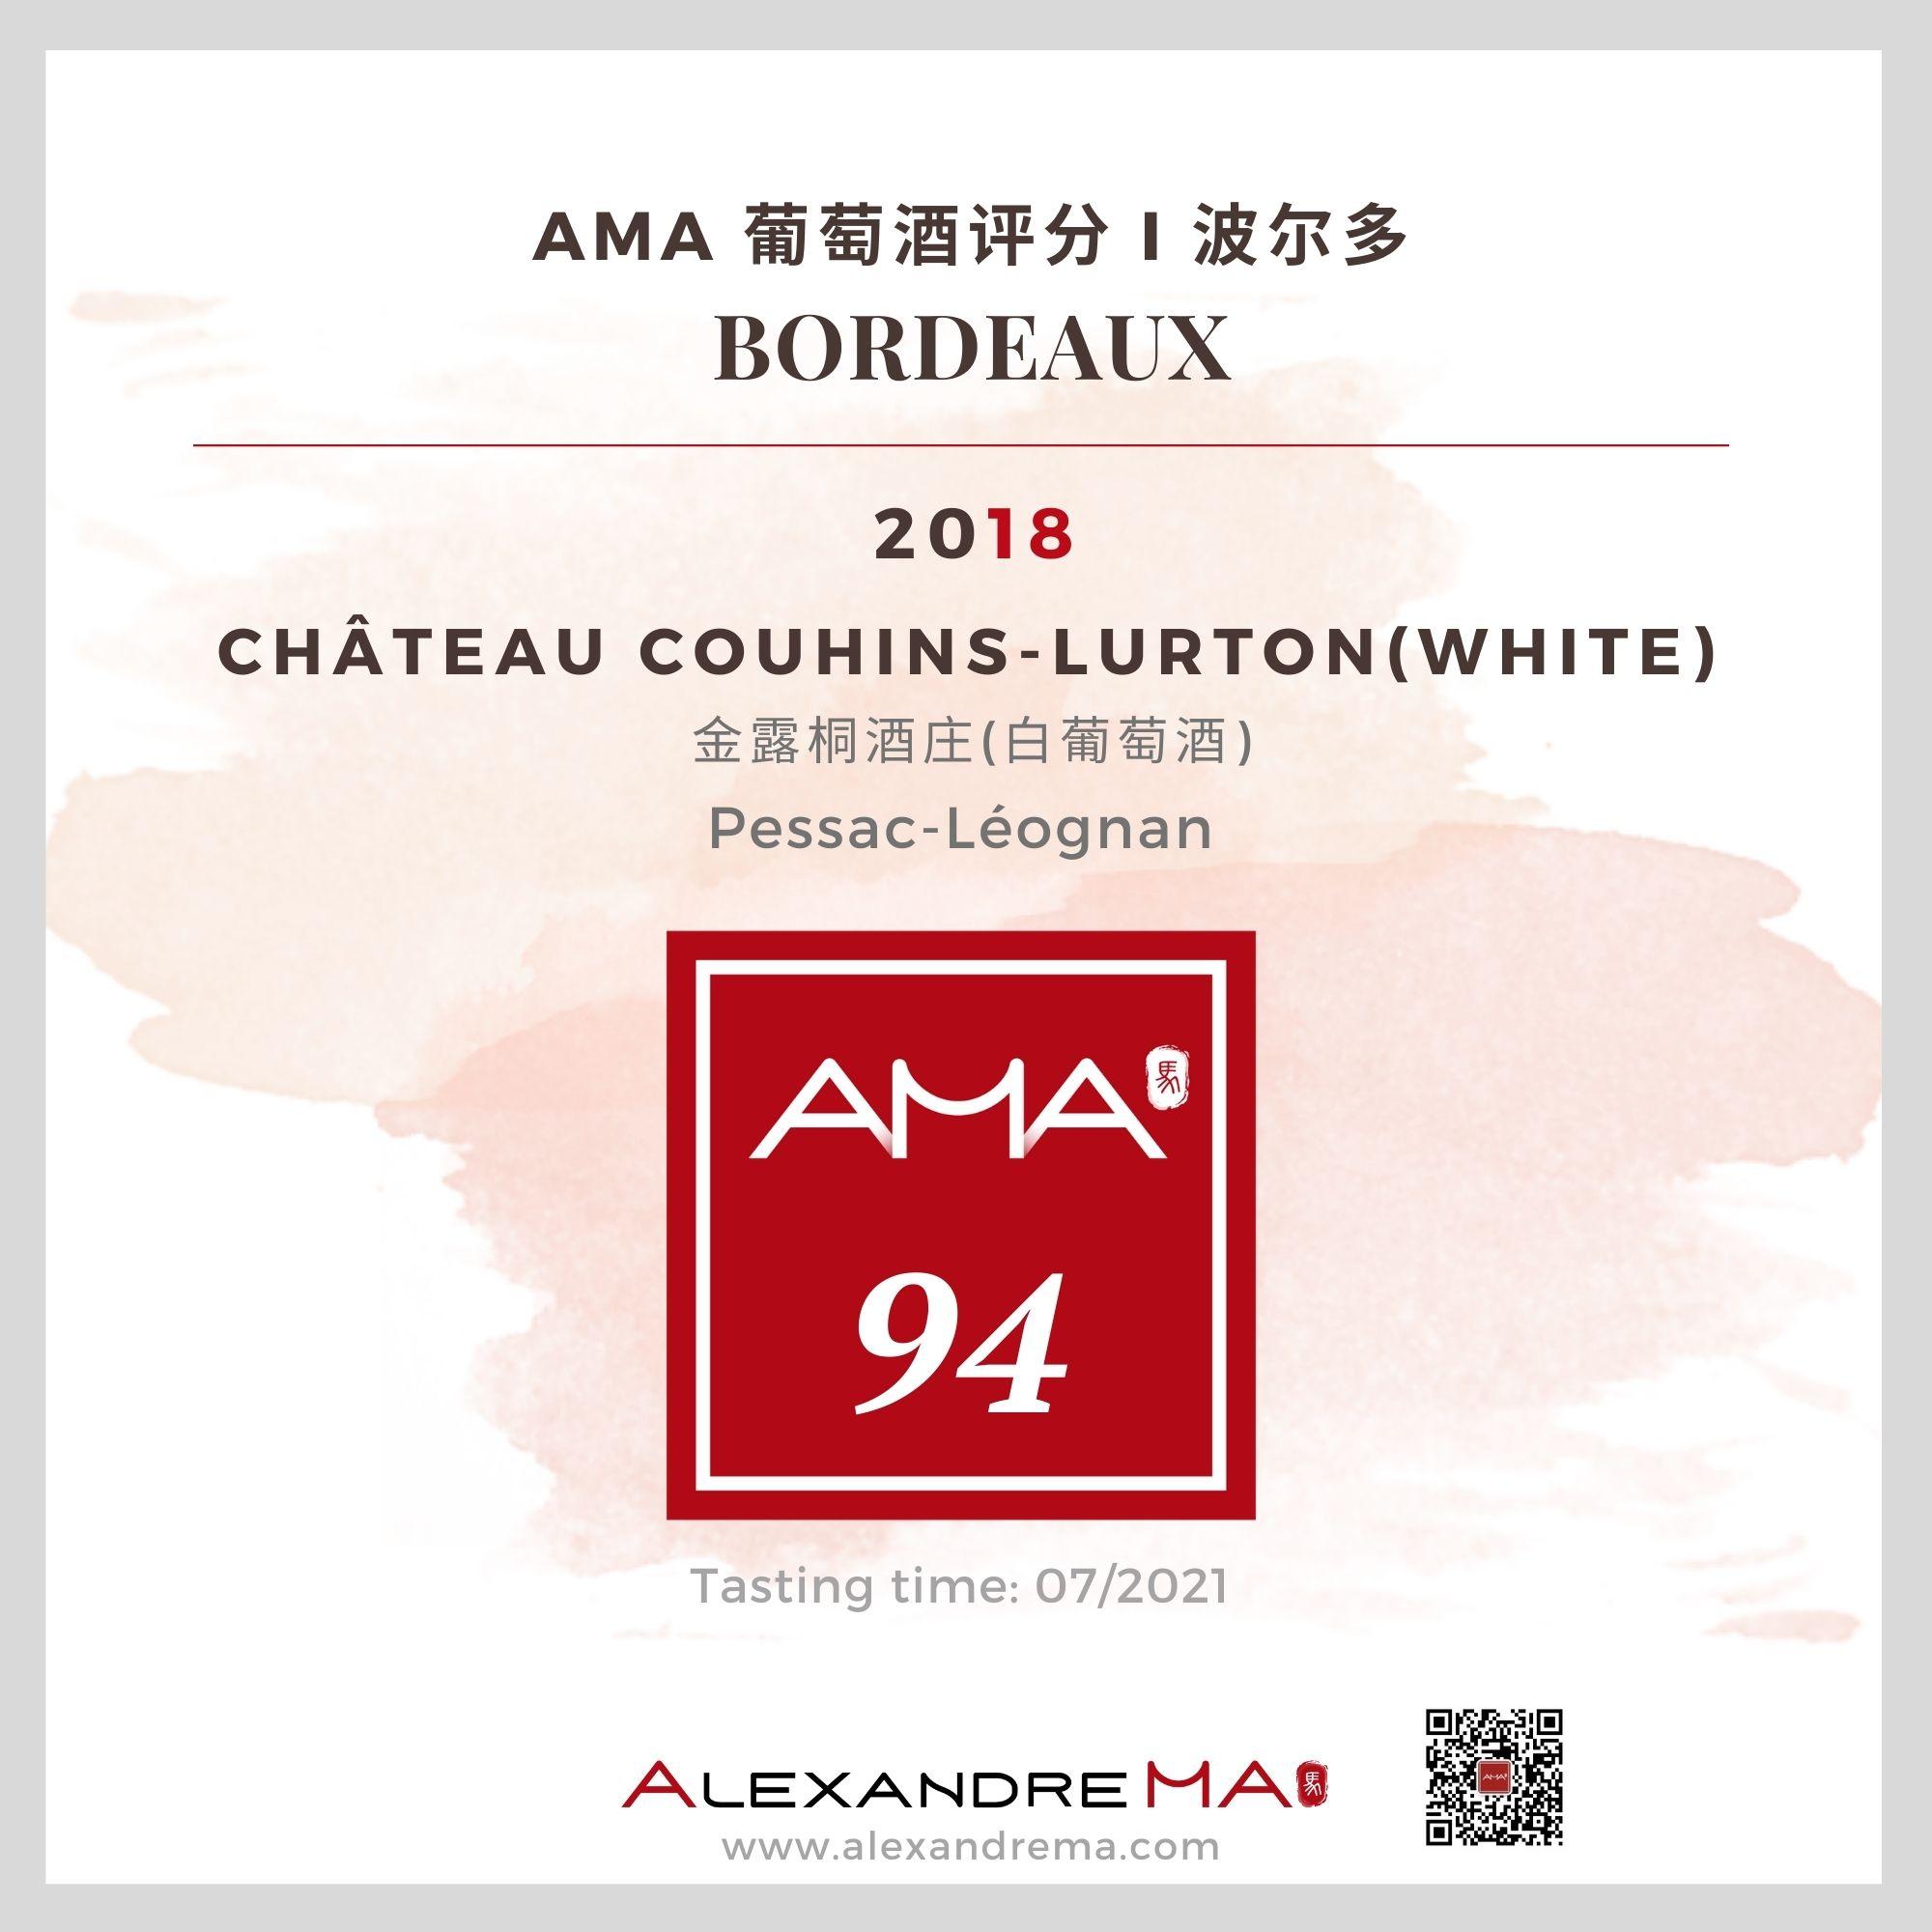 Château Couhins-Lurton White 2018 金露桐酒庄 - Alexandre Ma